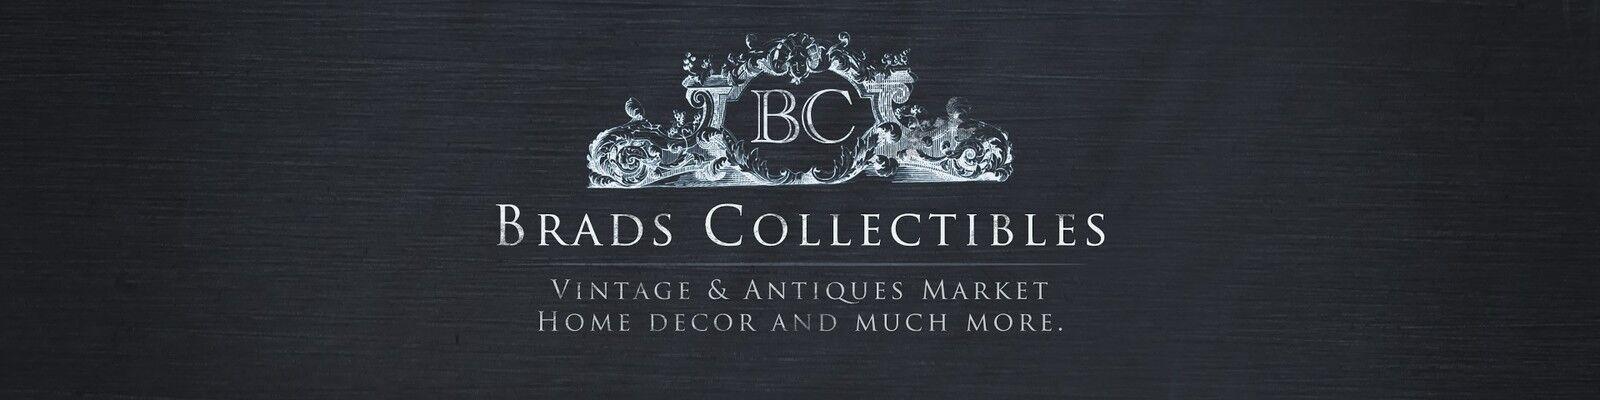 Brad's Collectibles